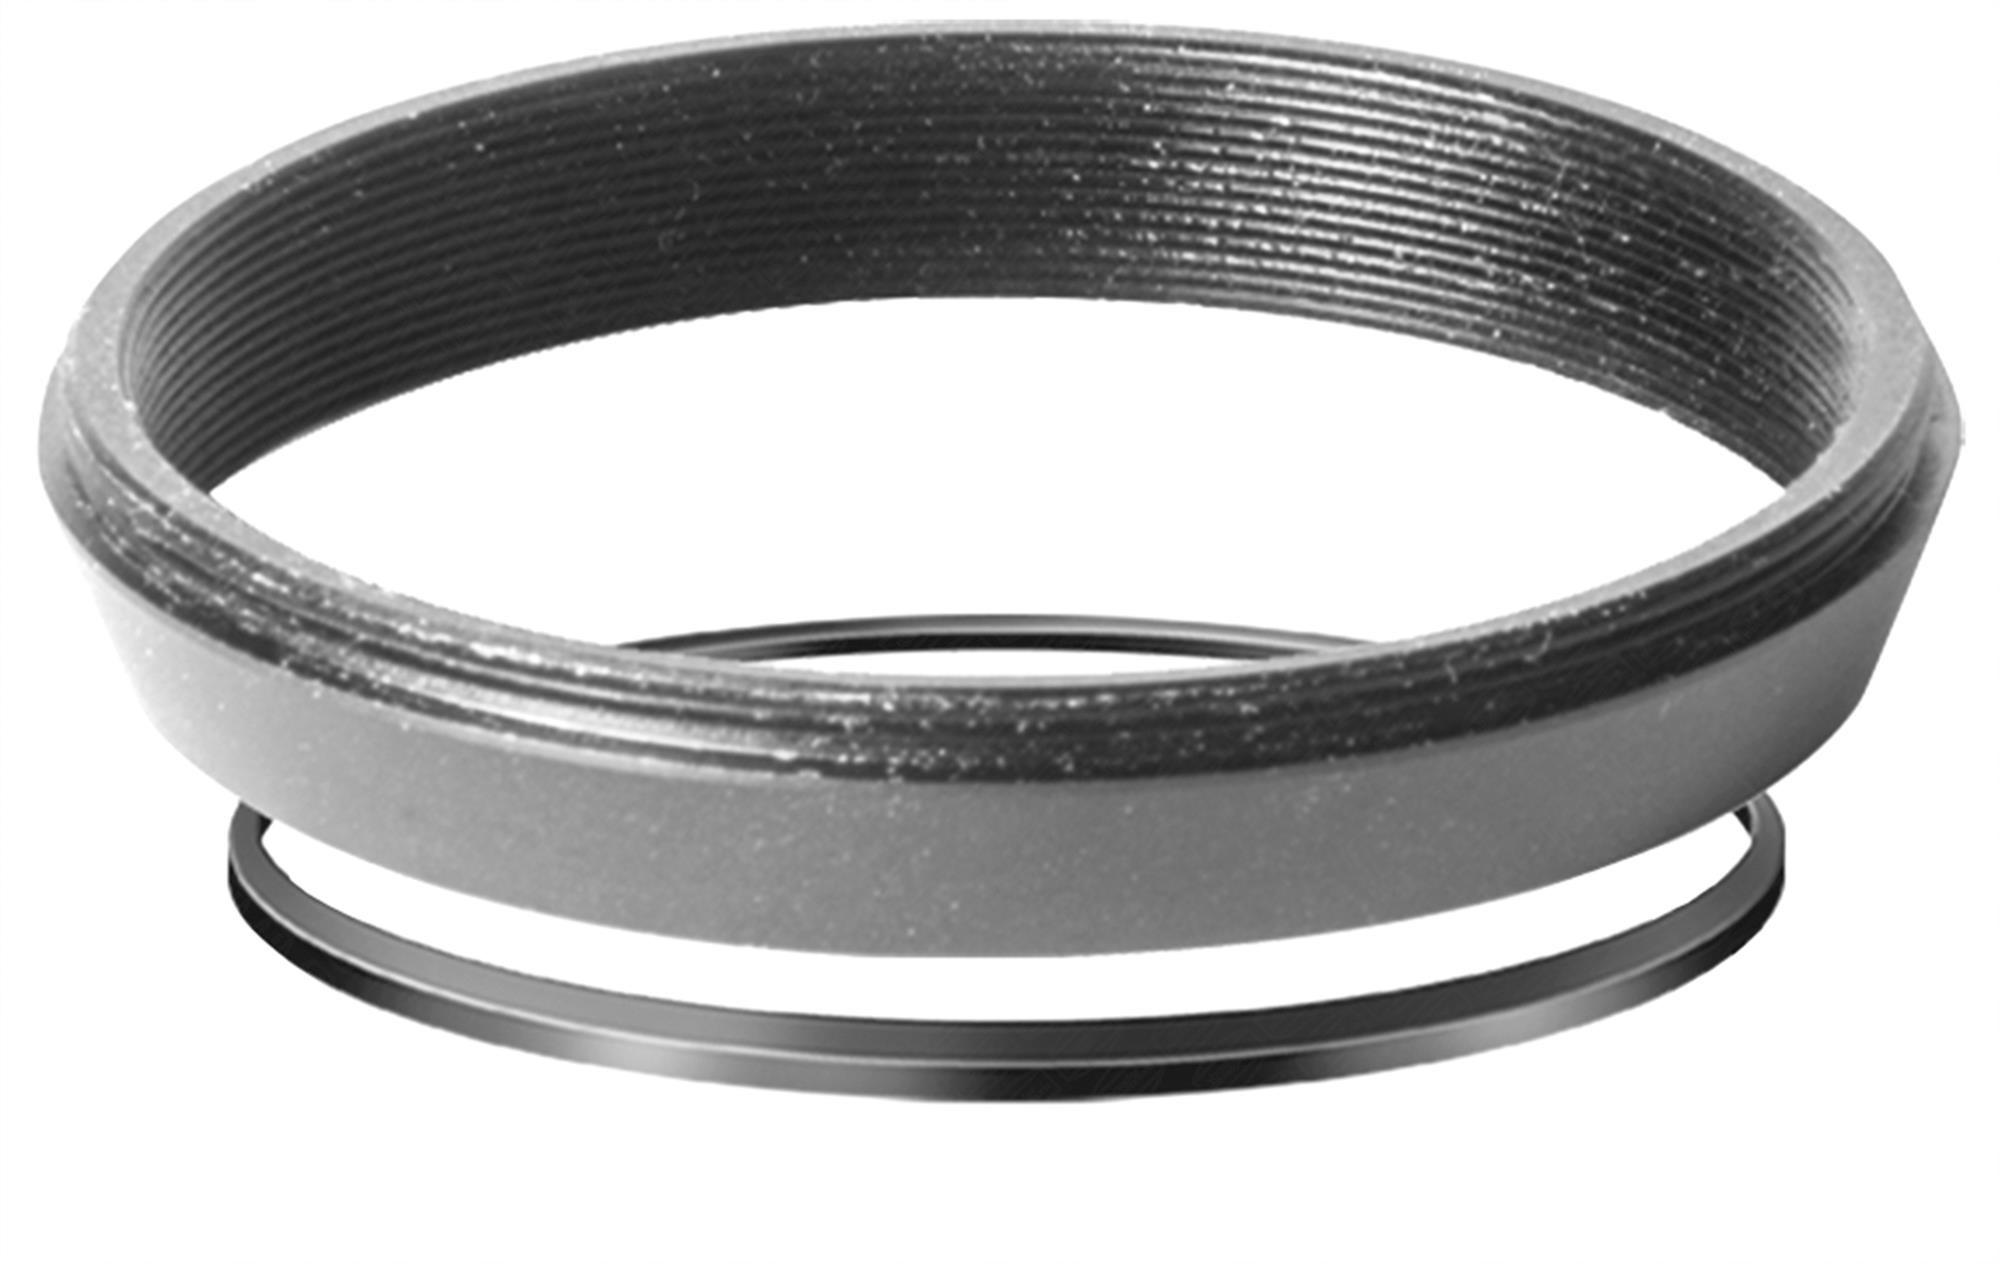 Hyperion DT-Ring SP54/M58